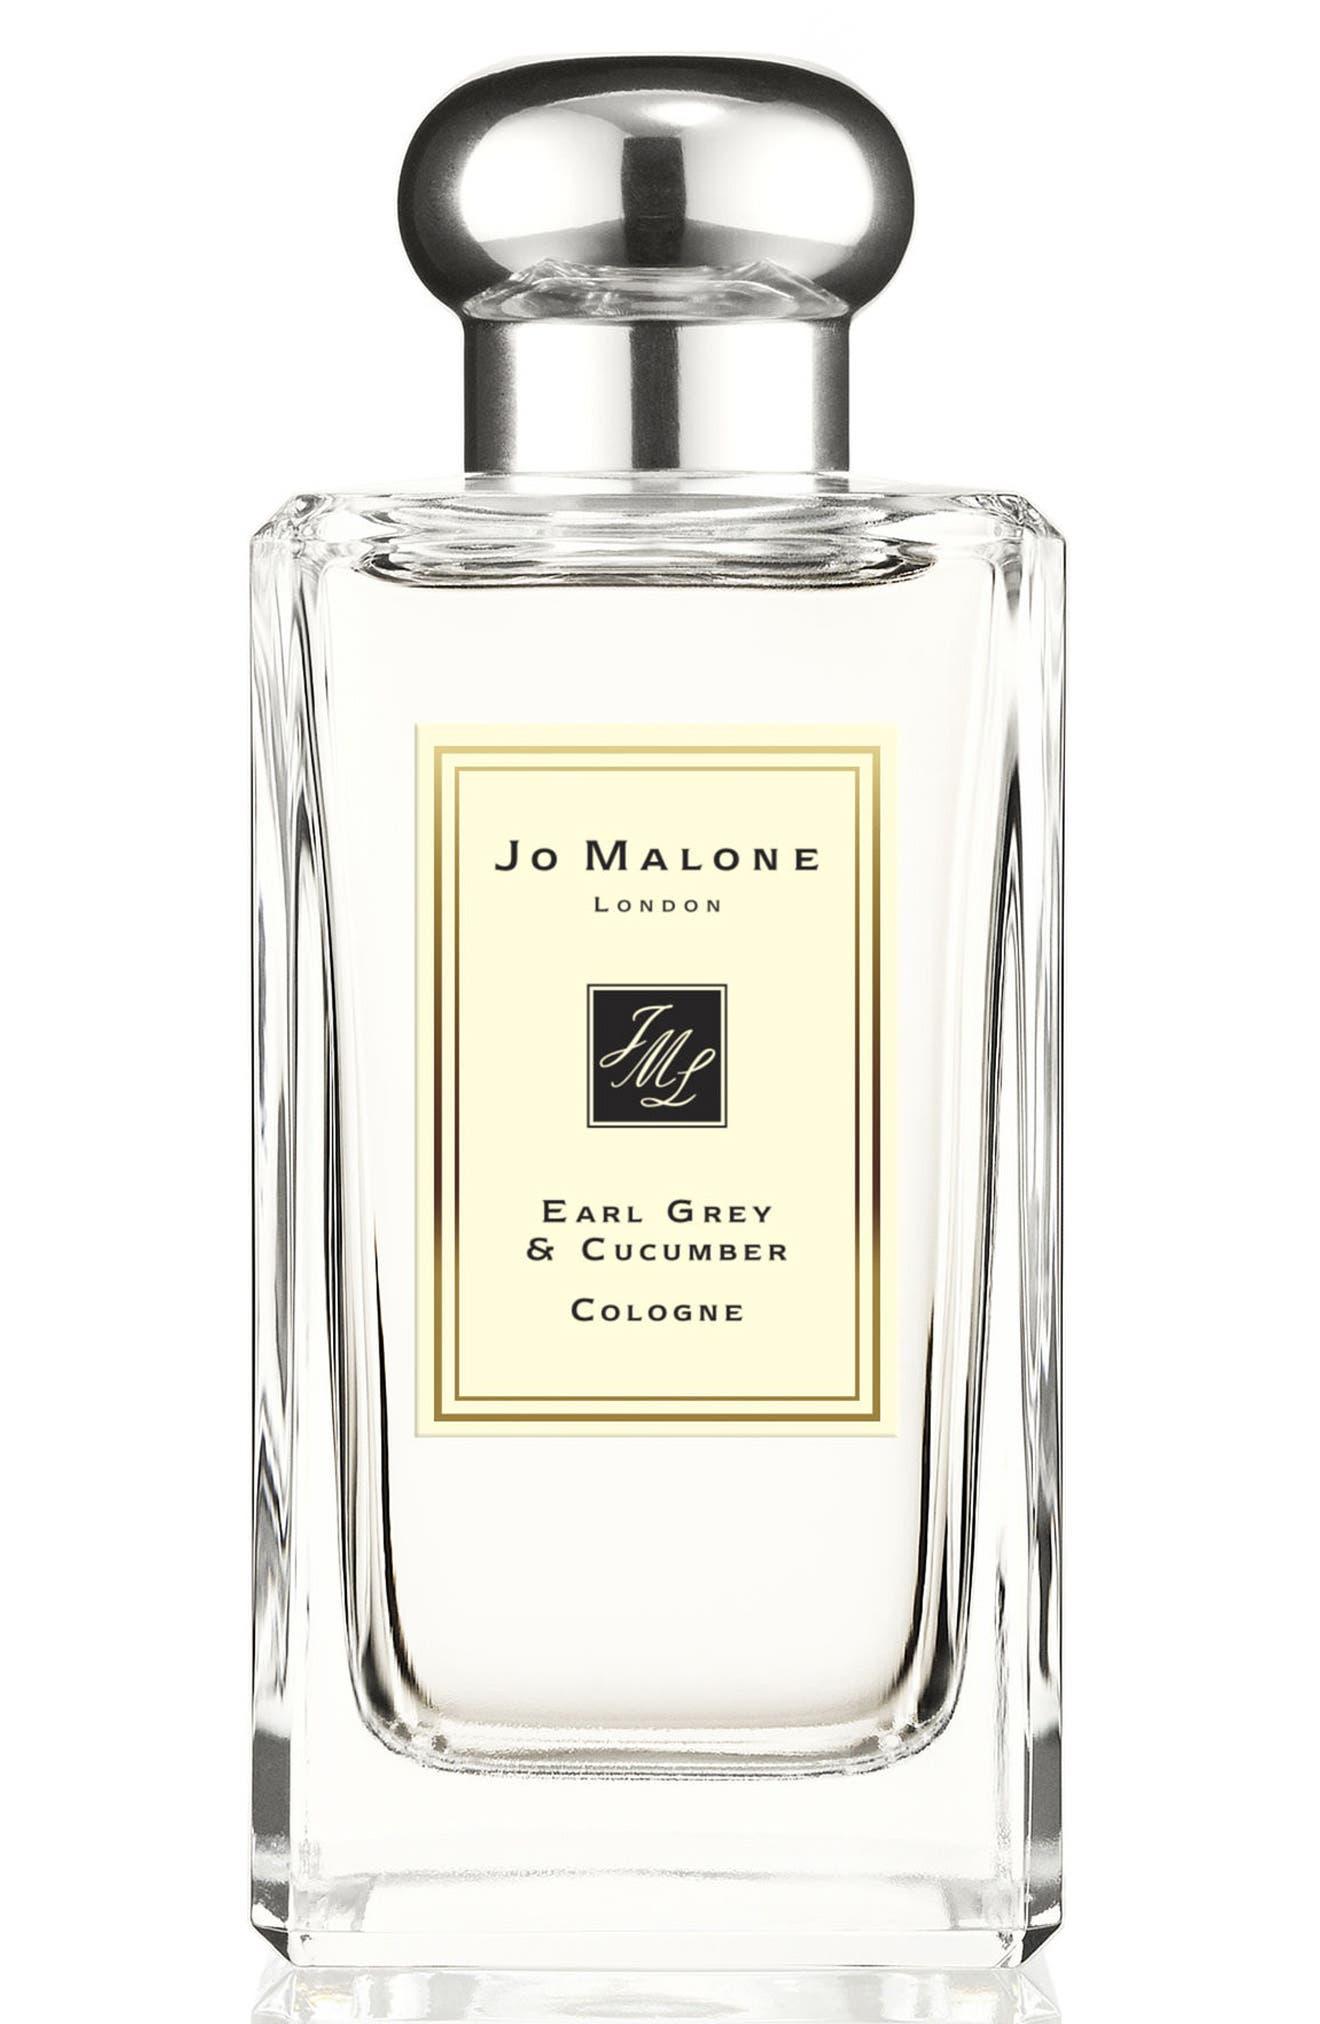 Jo Malone London(TM) Earl Grey & Cucumber Cologne